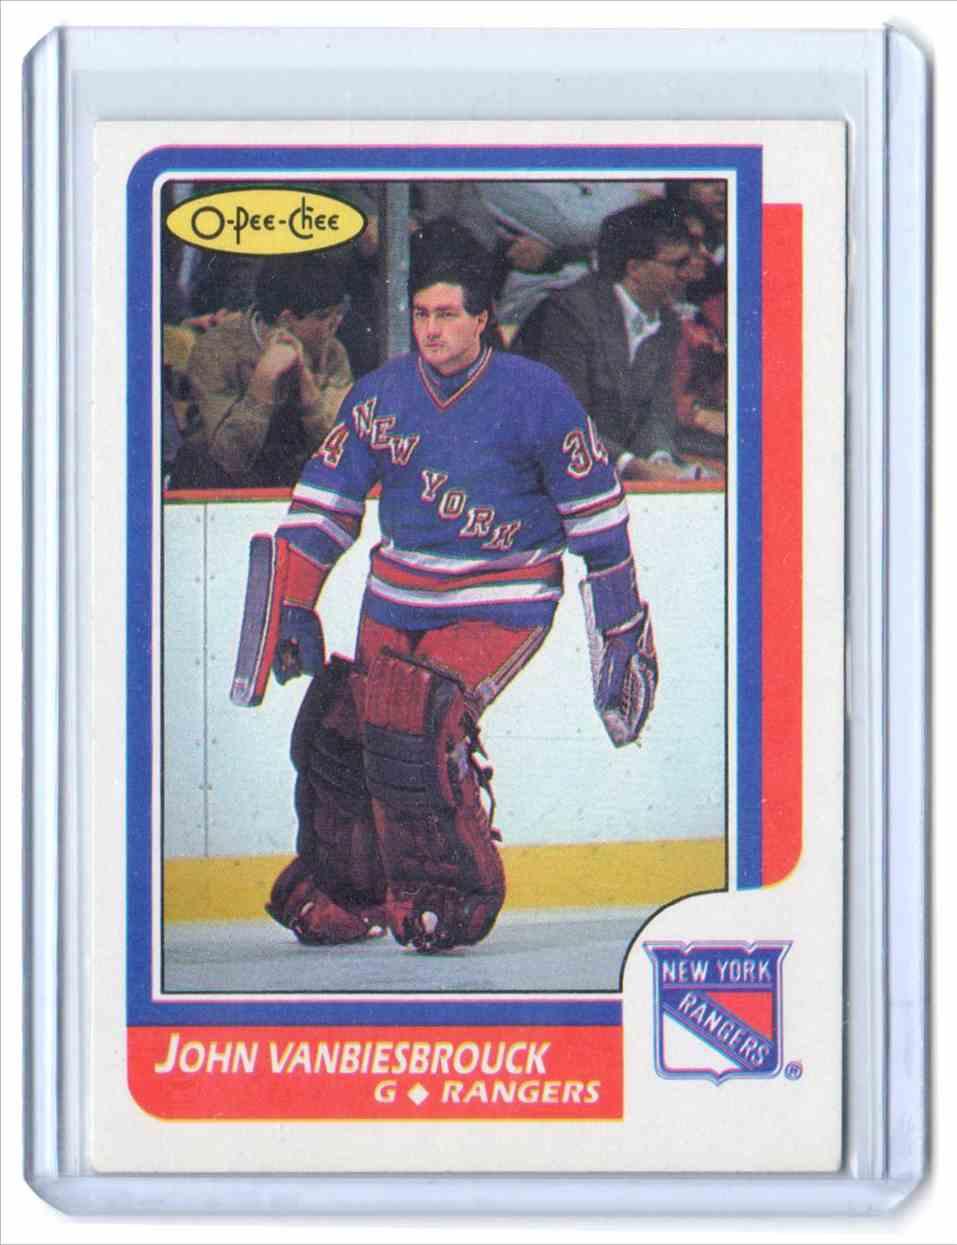 1986-87 O-Pee-Chee John Vanbiesbrouck #9 card front image